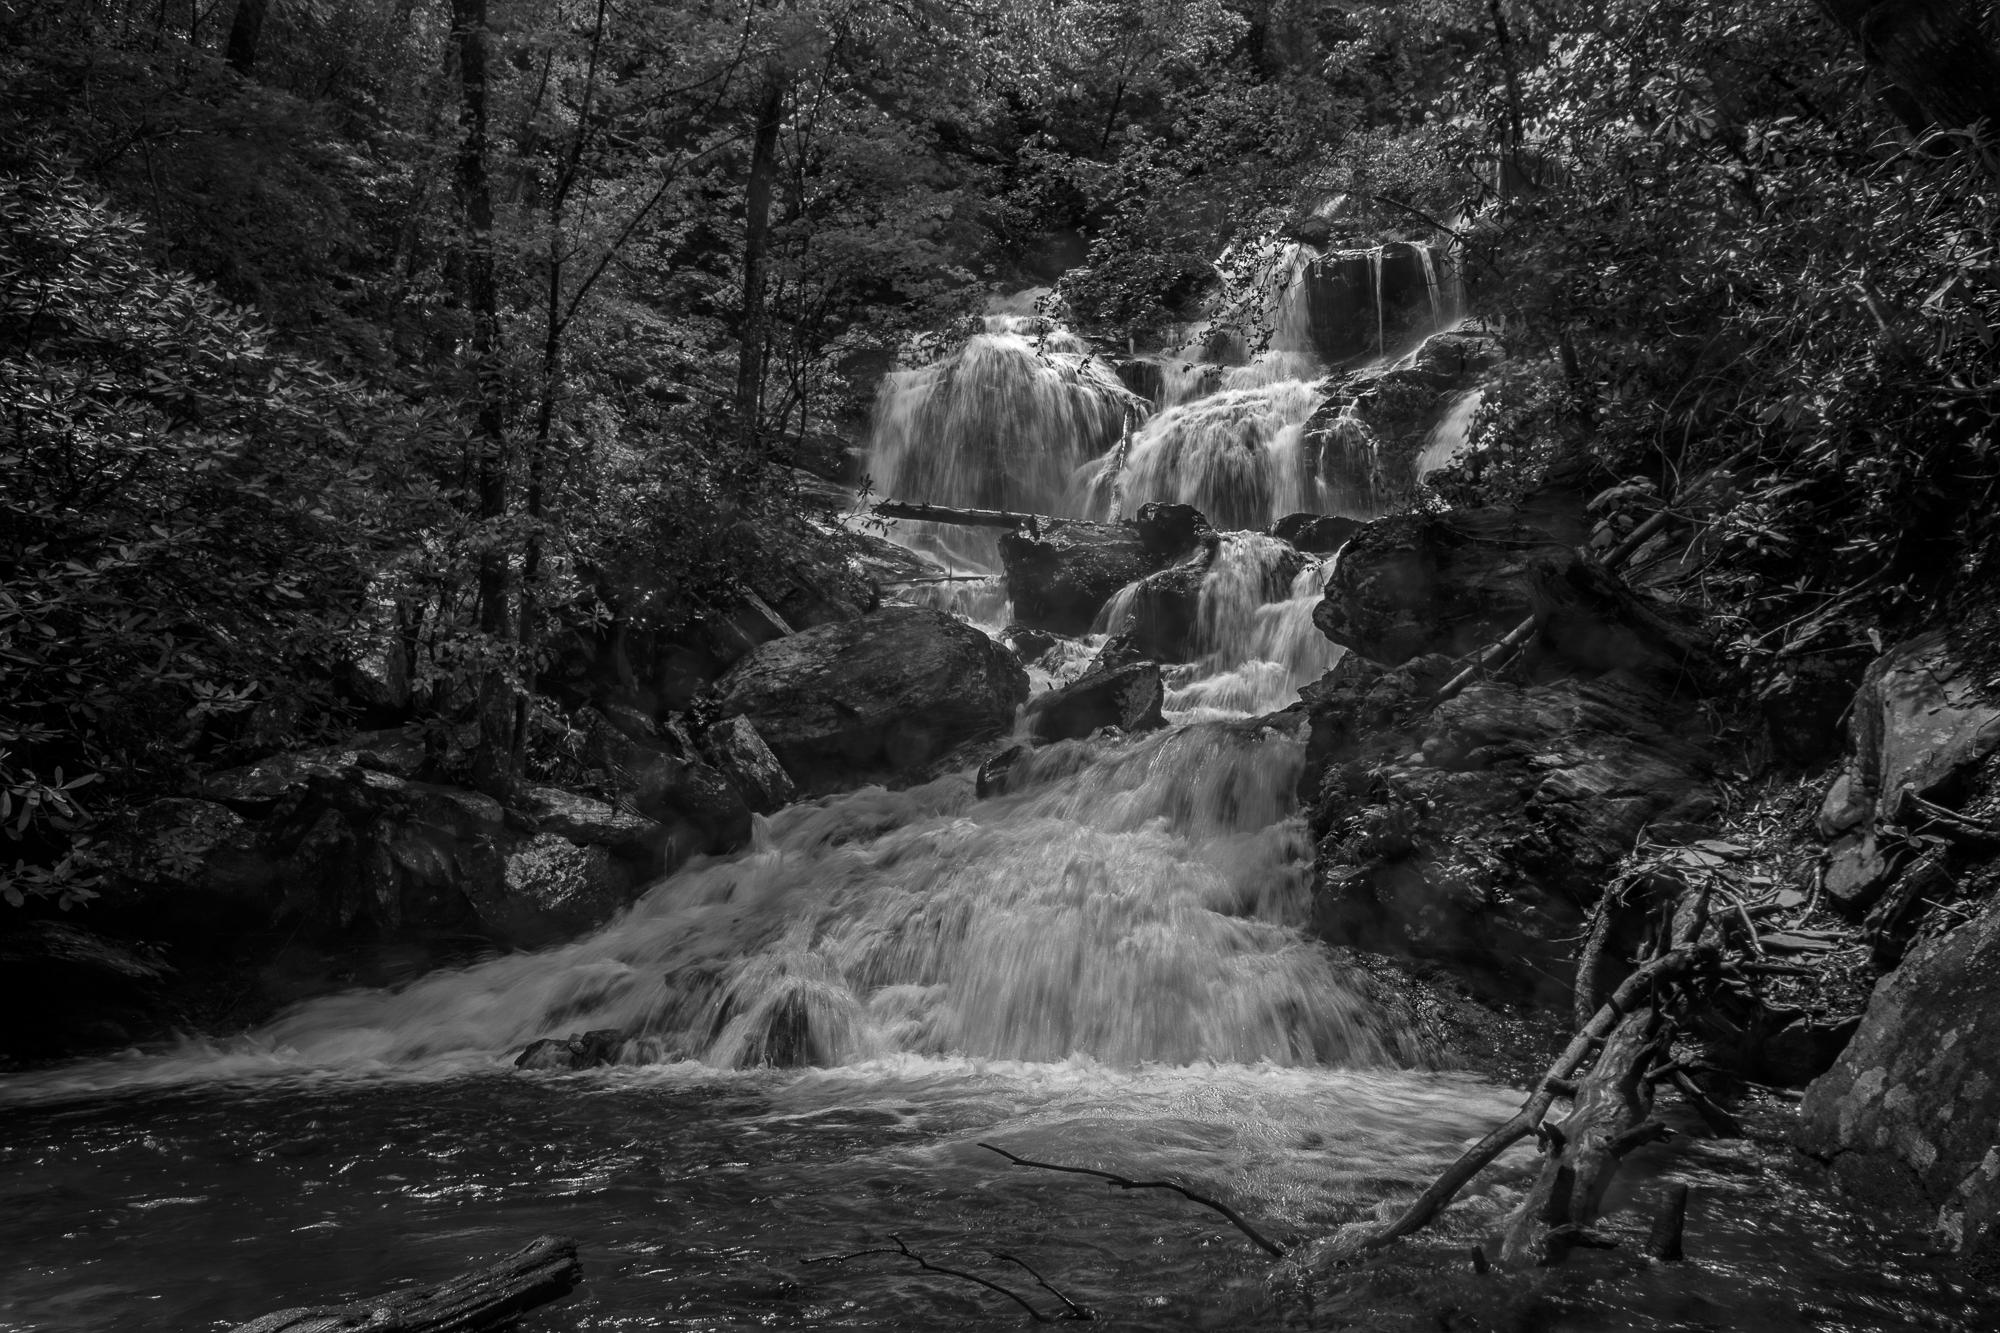 Catawba Falls After the Rains